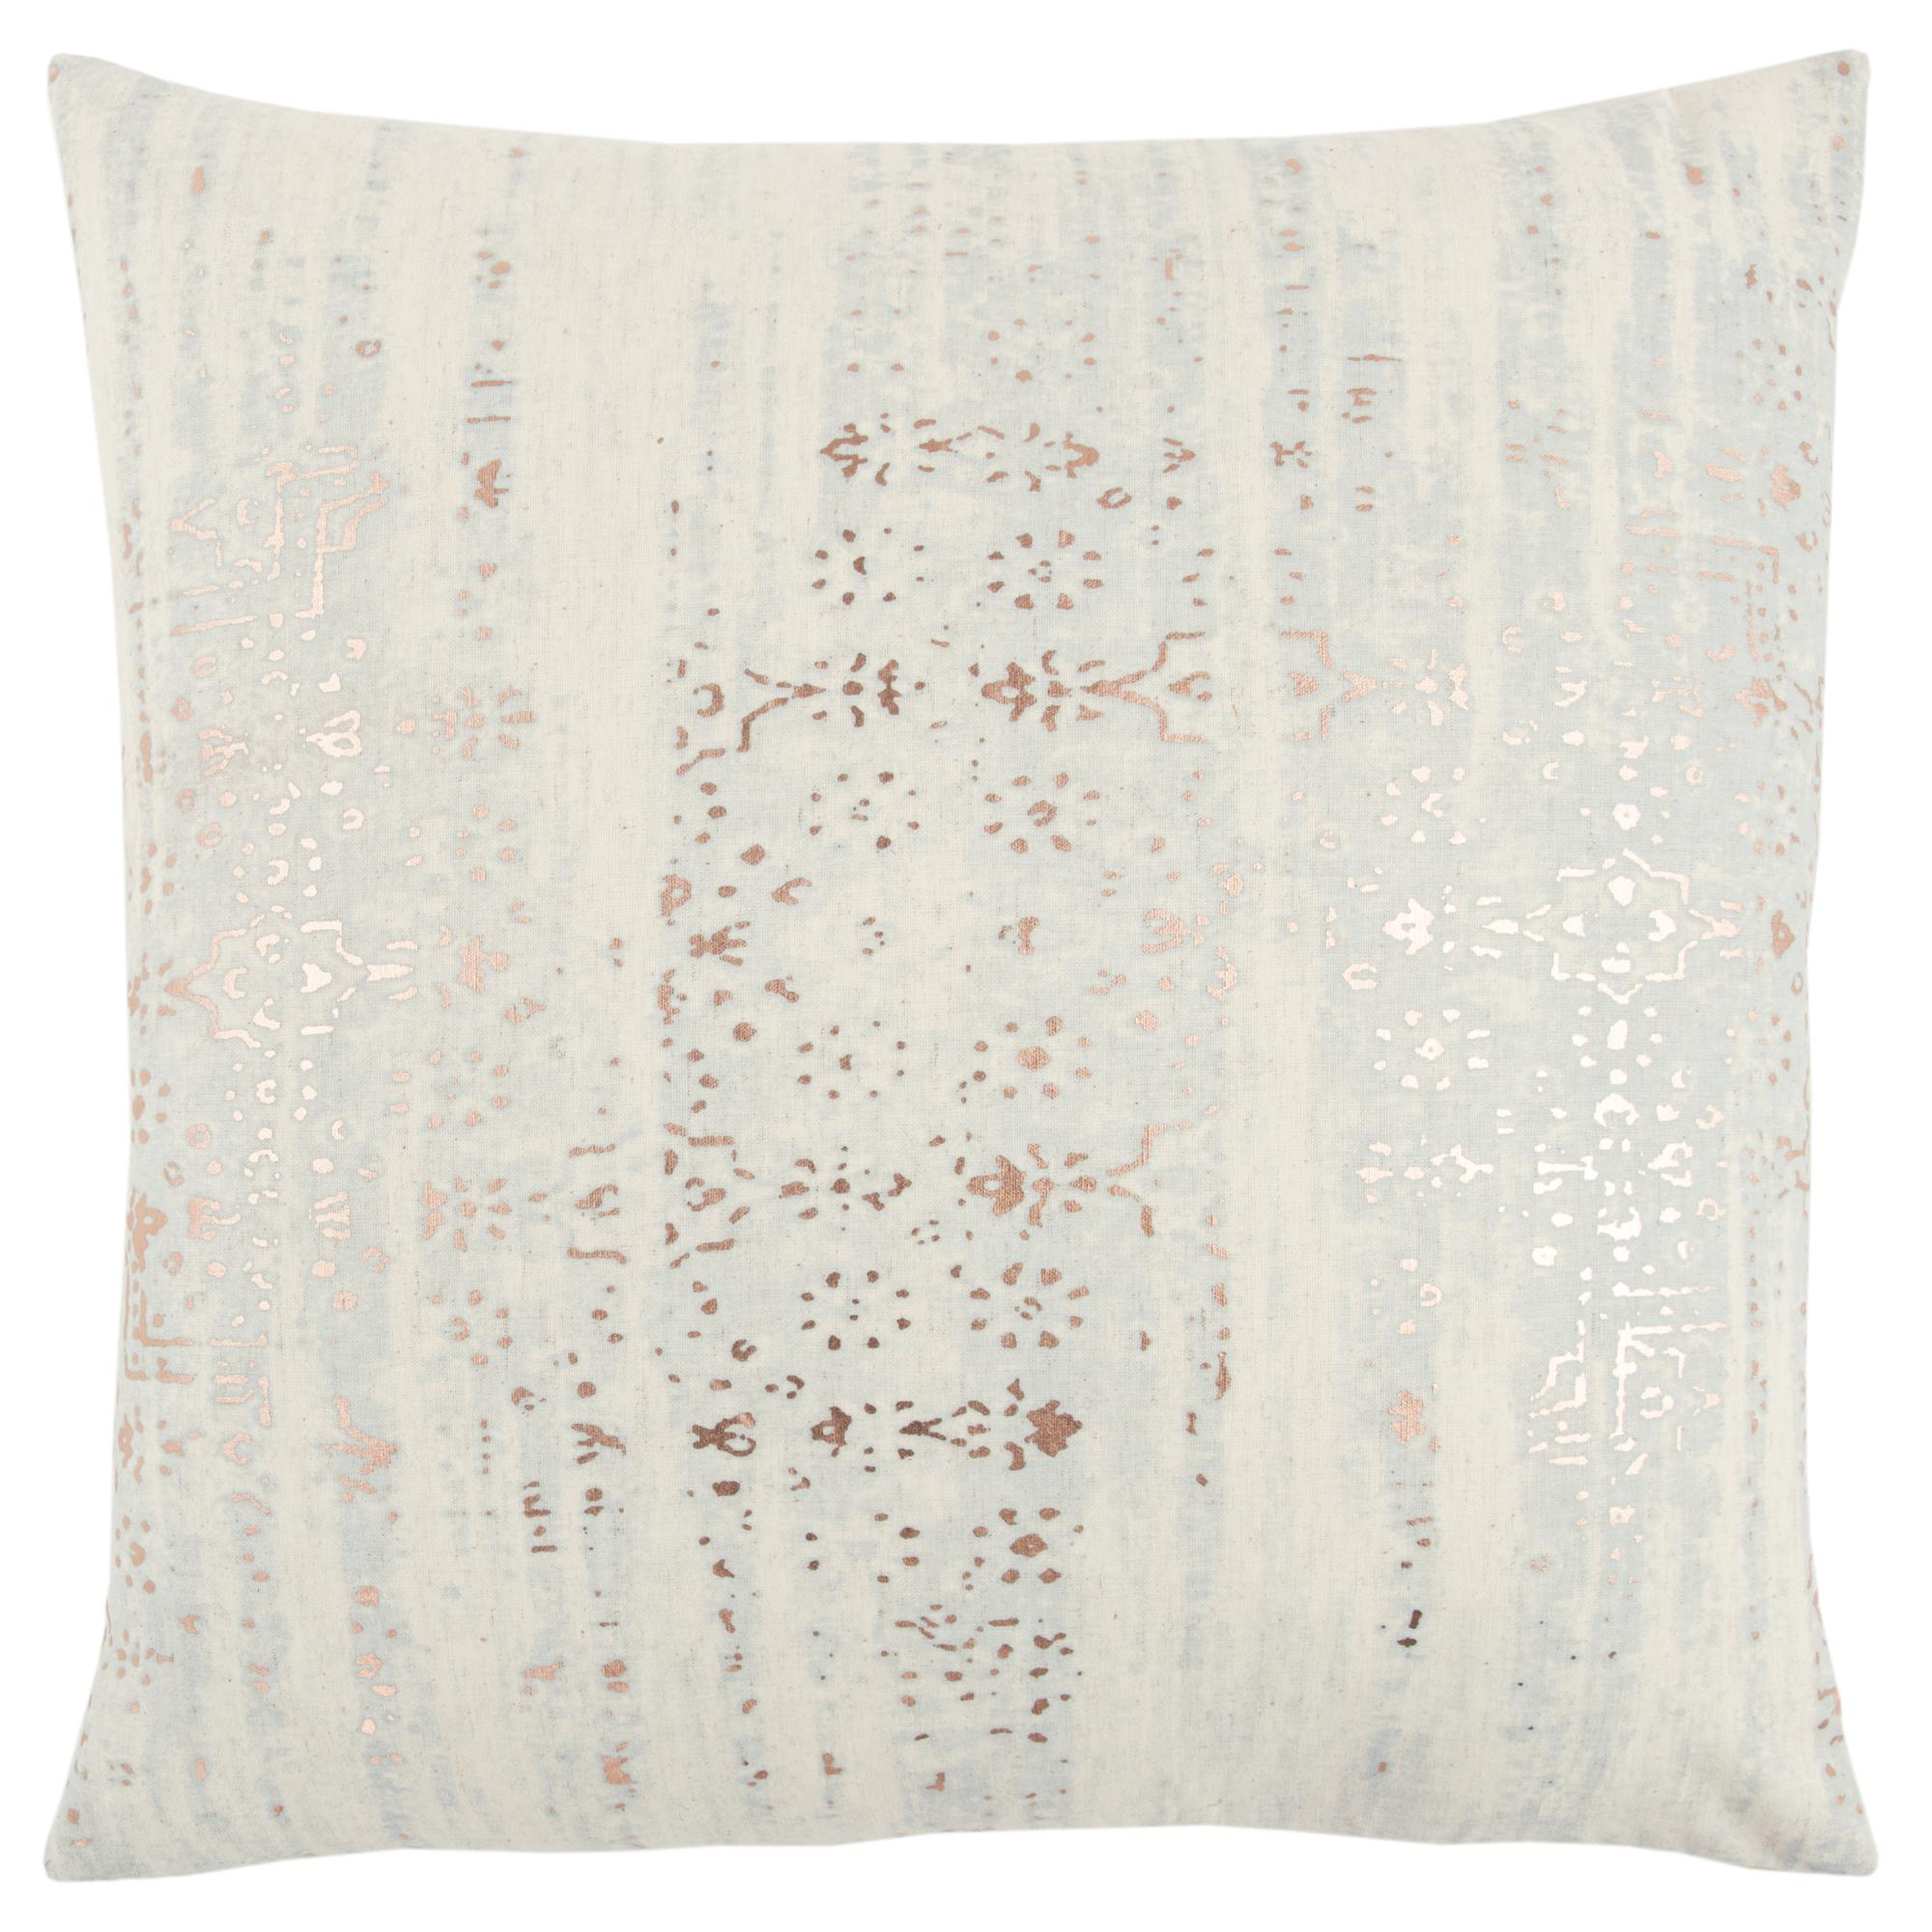 Rizzy Home Metallic-Wash Stripe Decorative Pillow